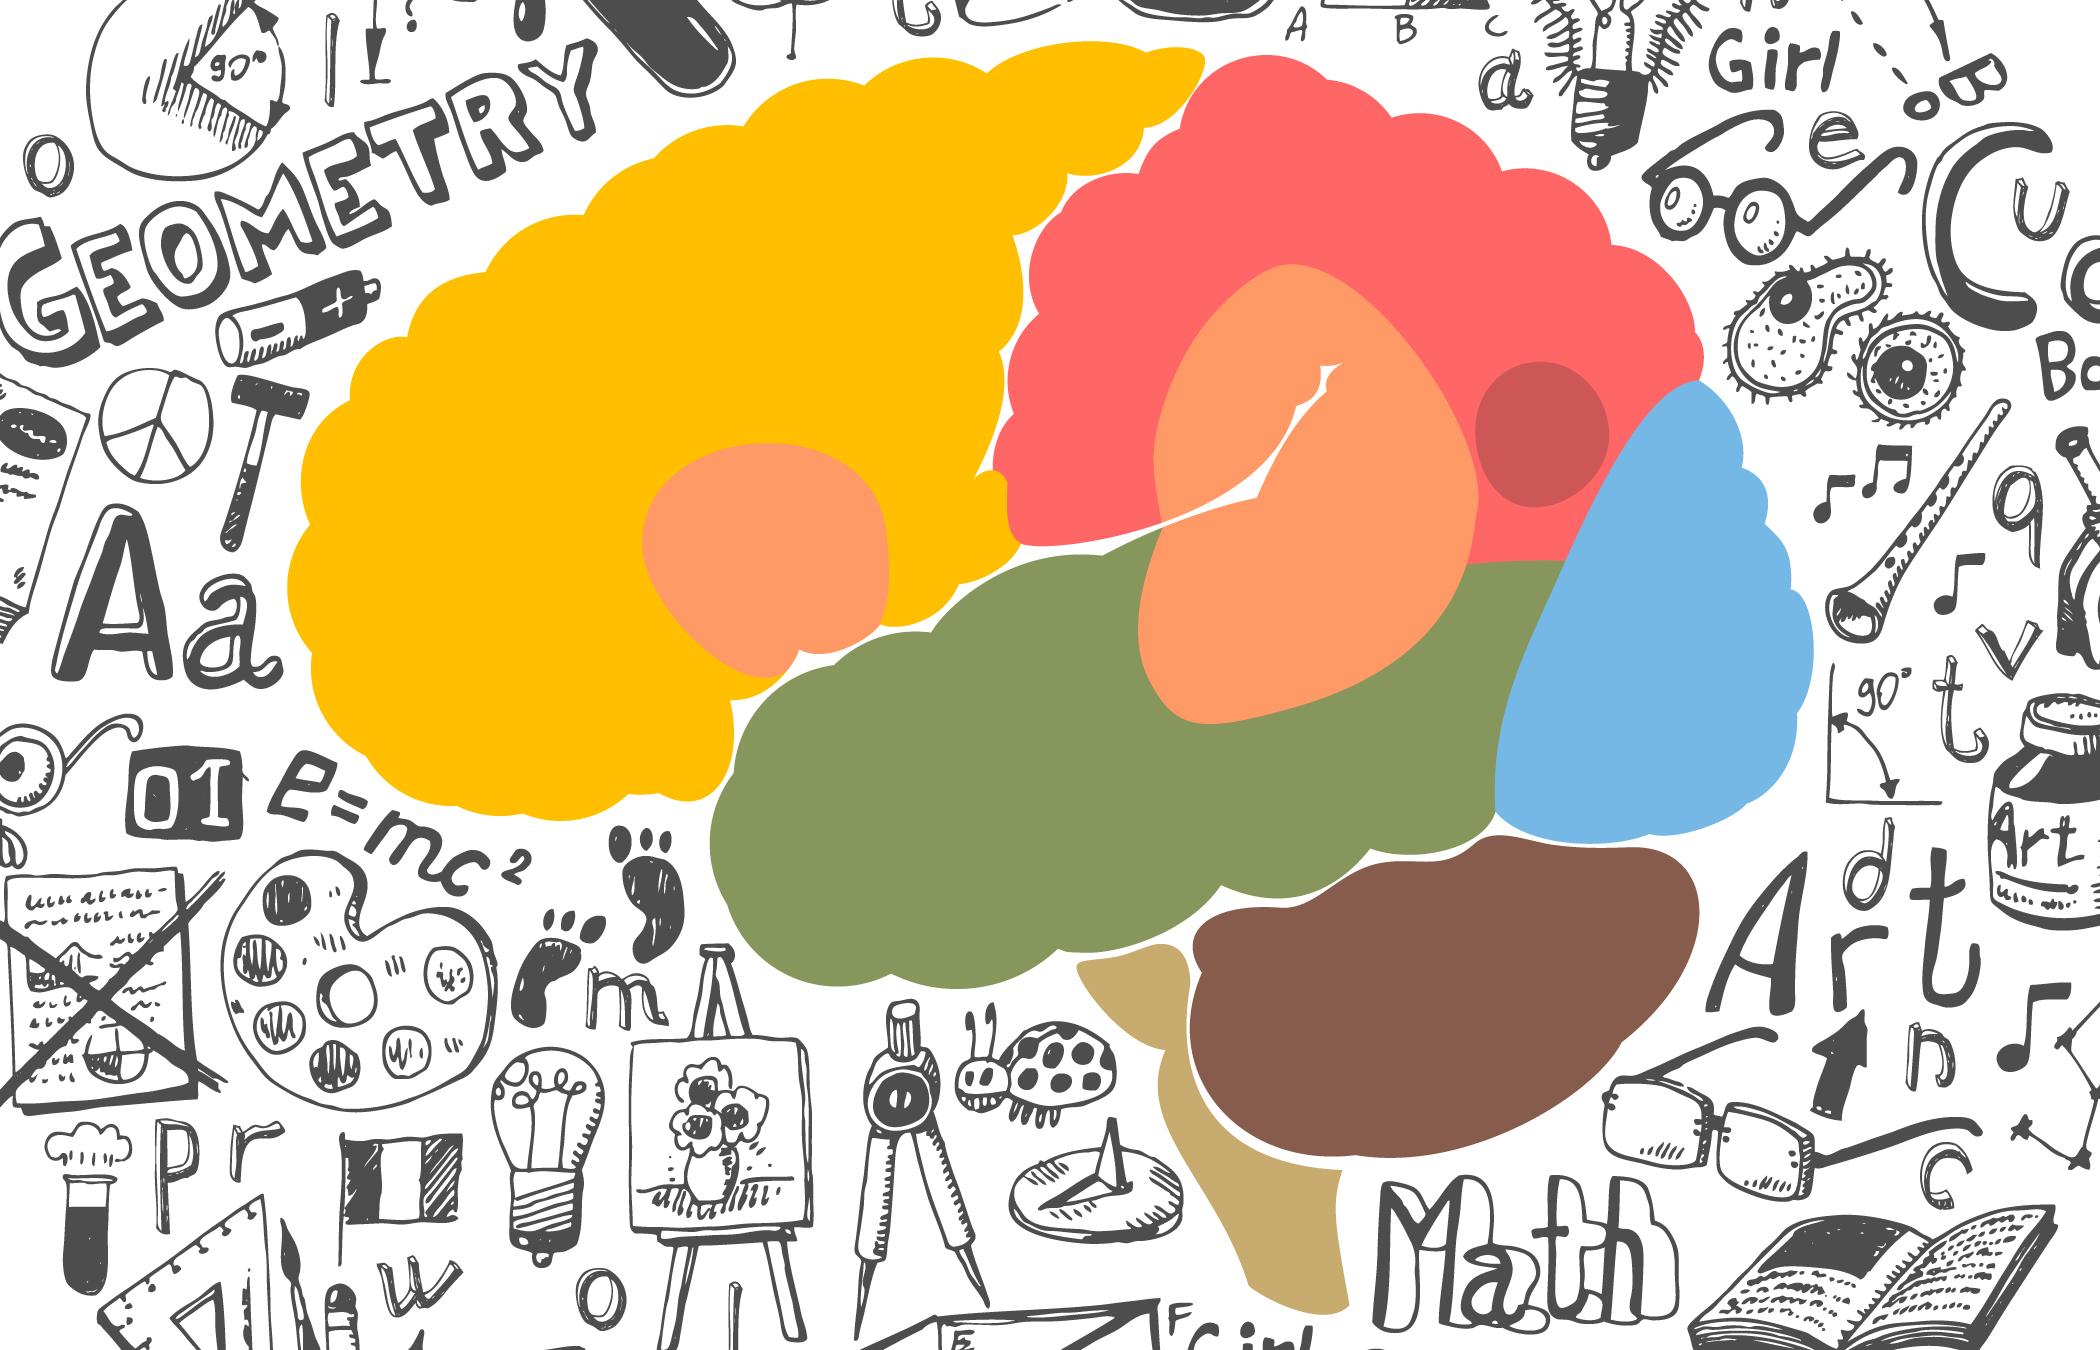 Brains clipart the adolescent Researchers brain of adolescent landmark